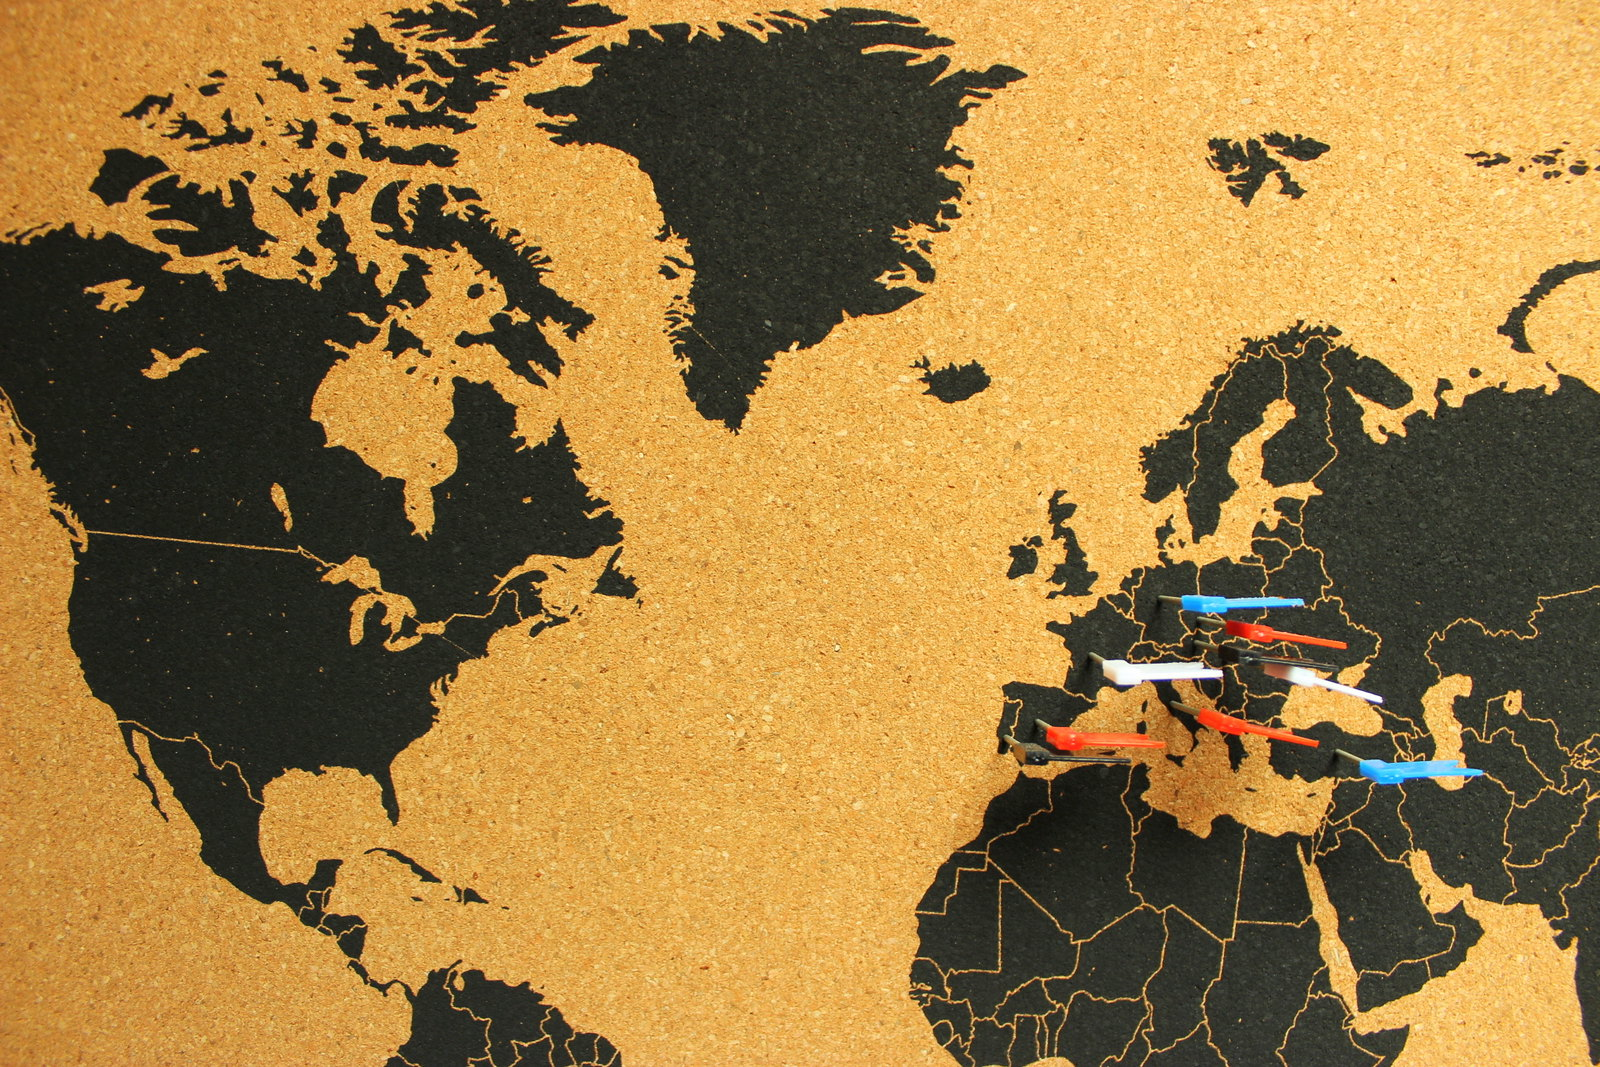 typo map